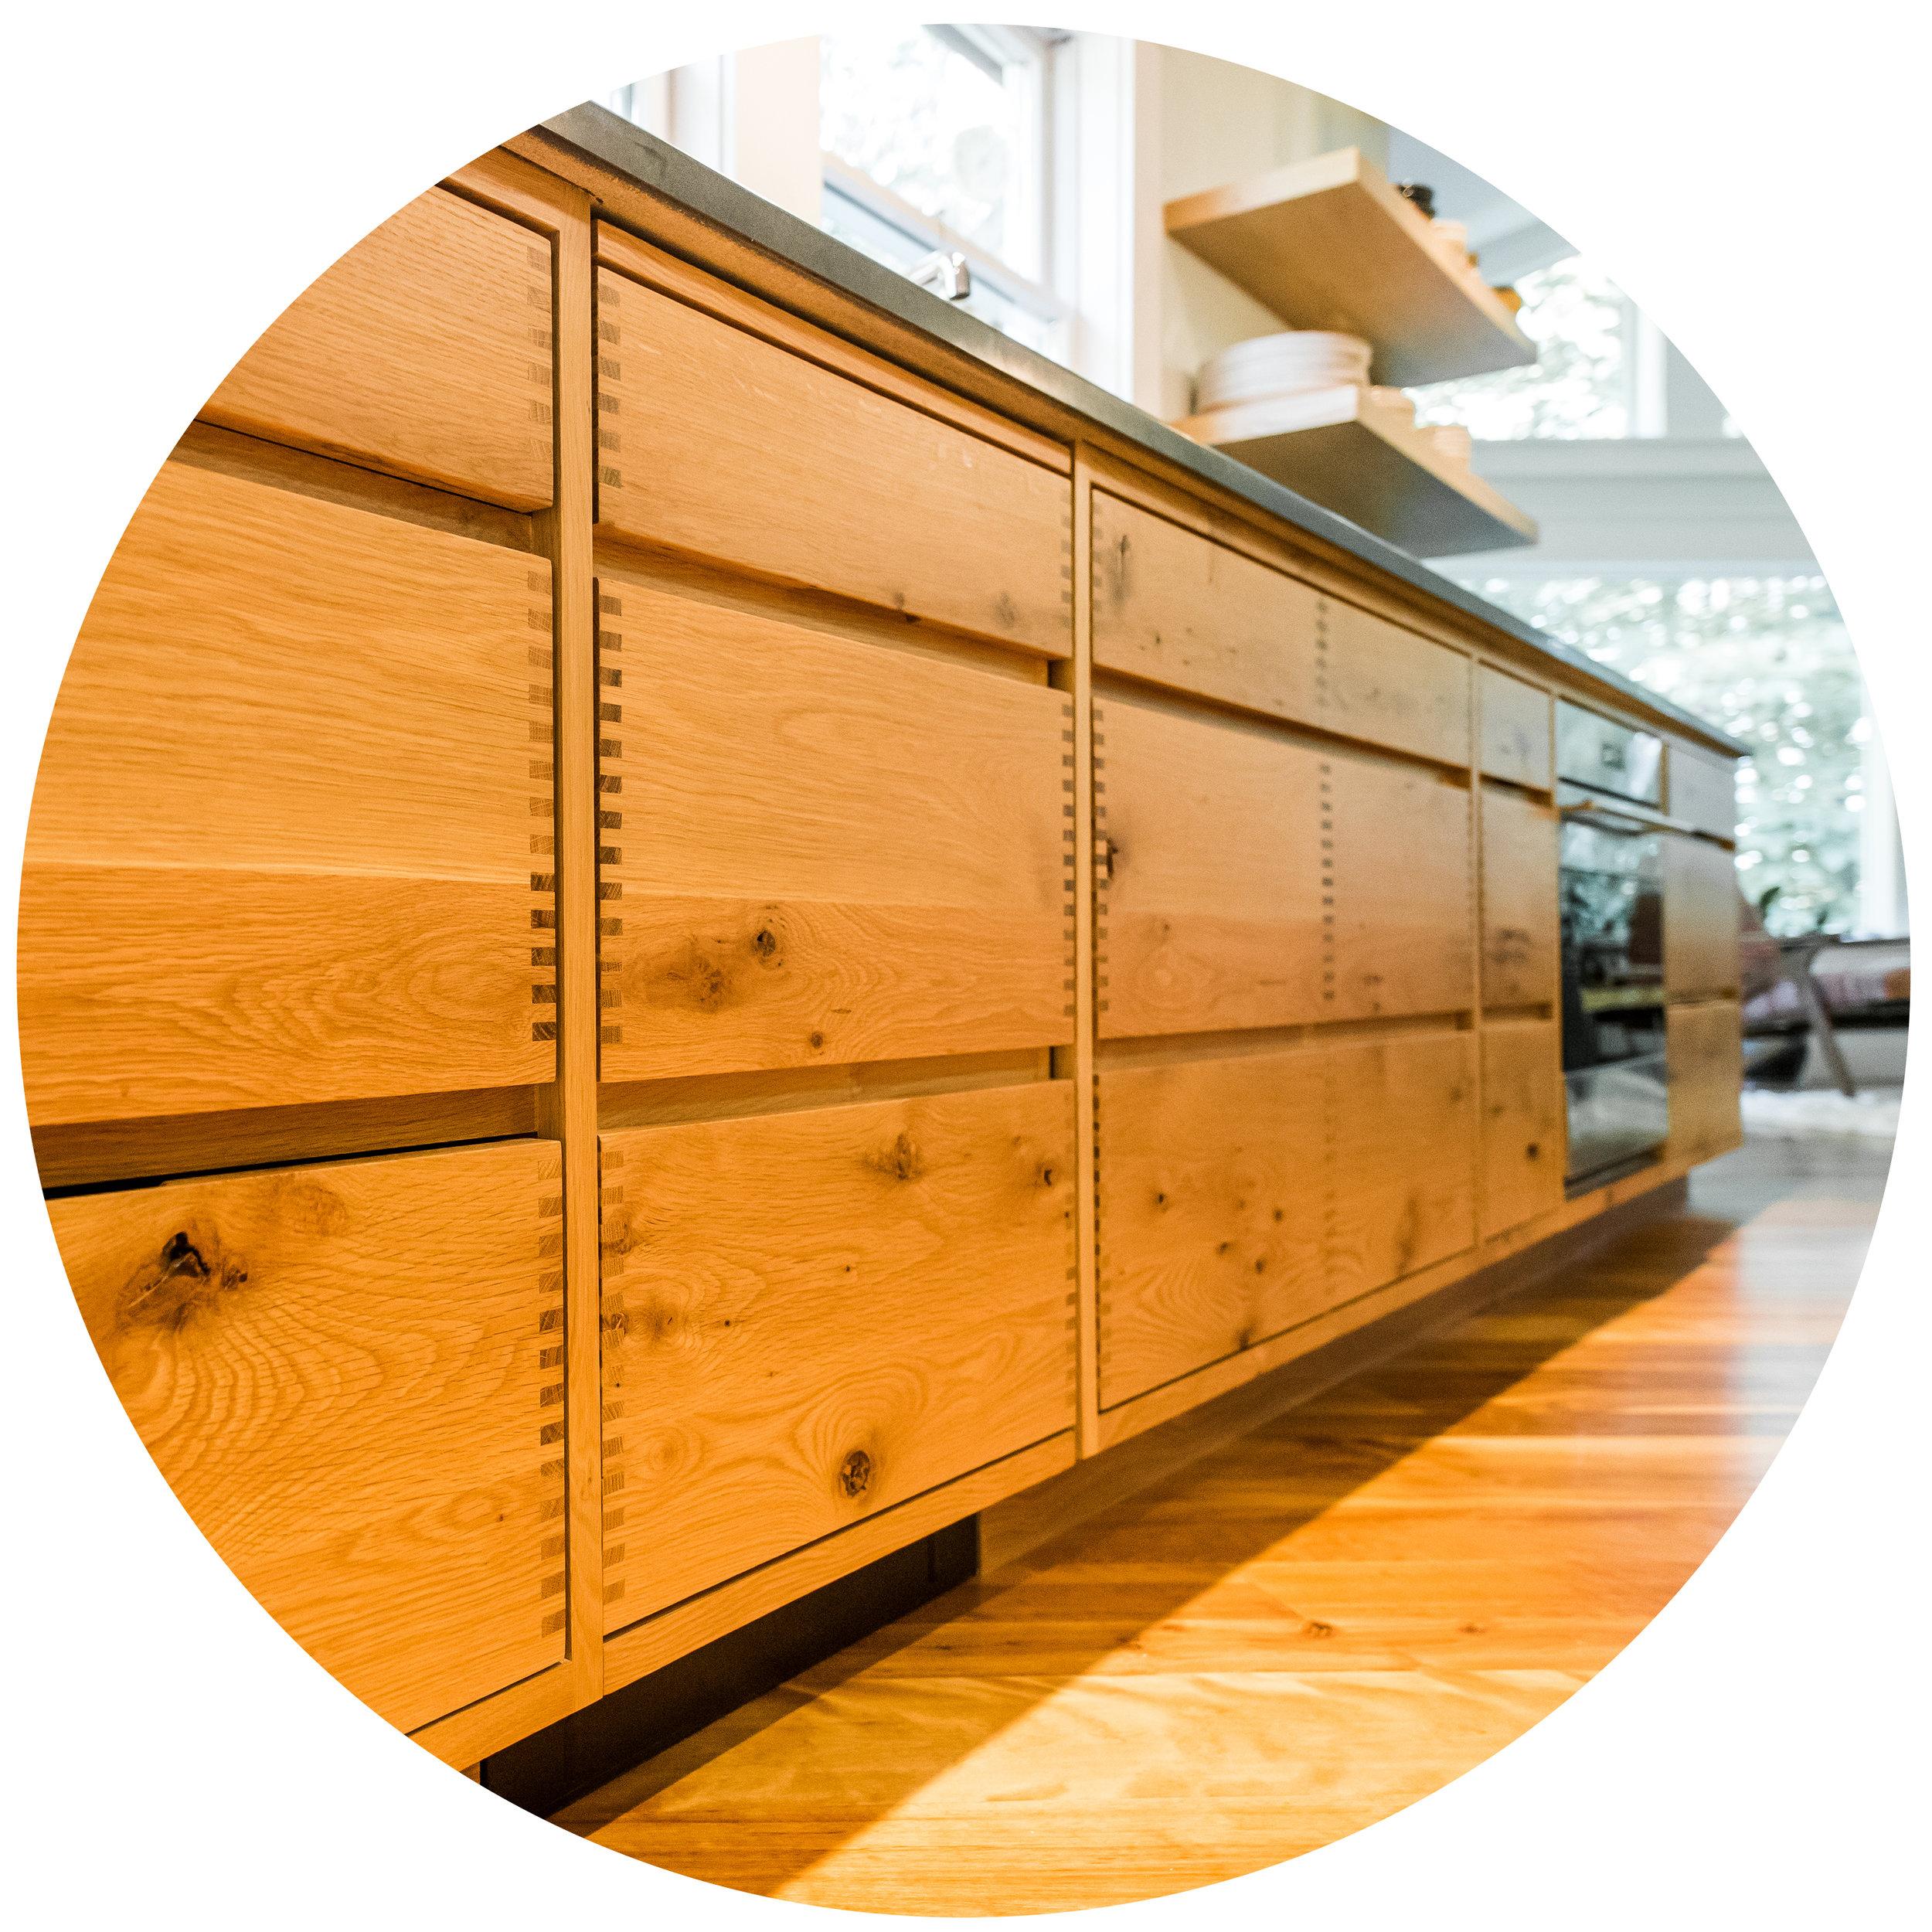 cabinetry-thumb.jpg